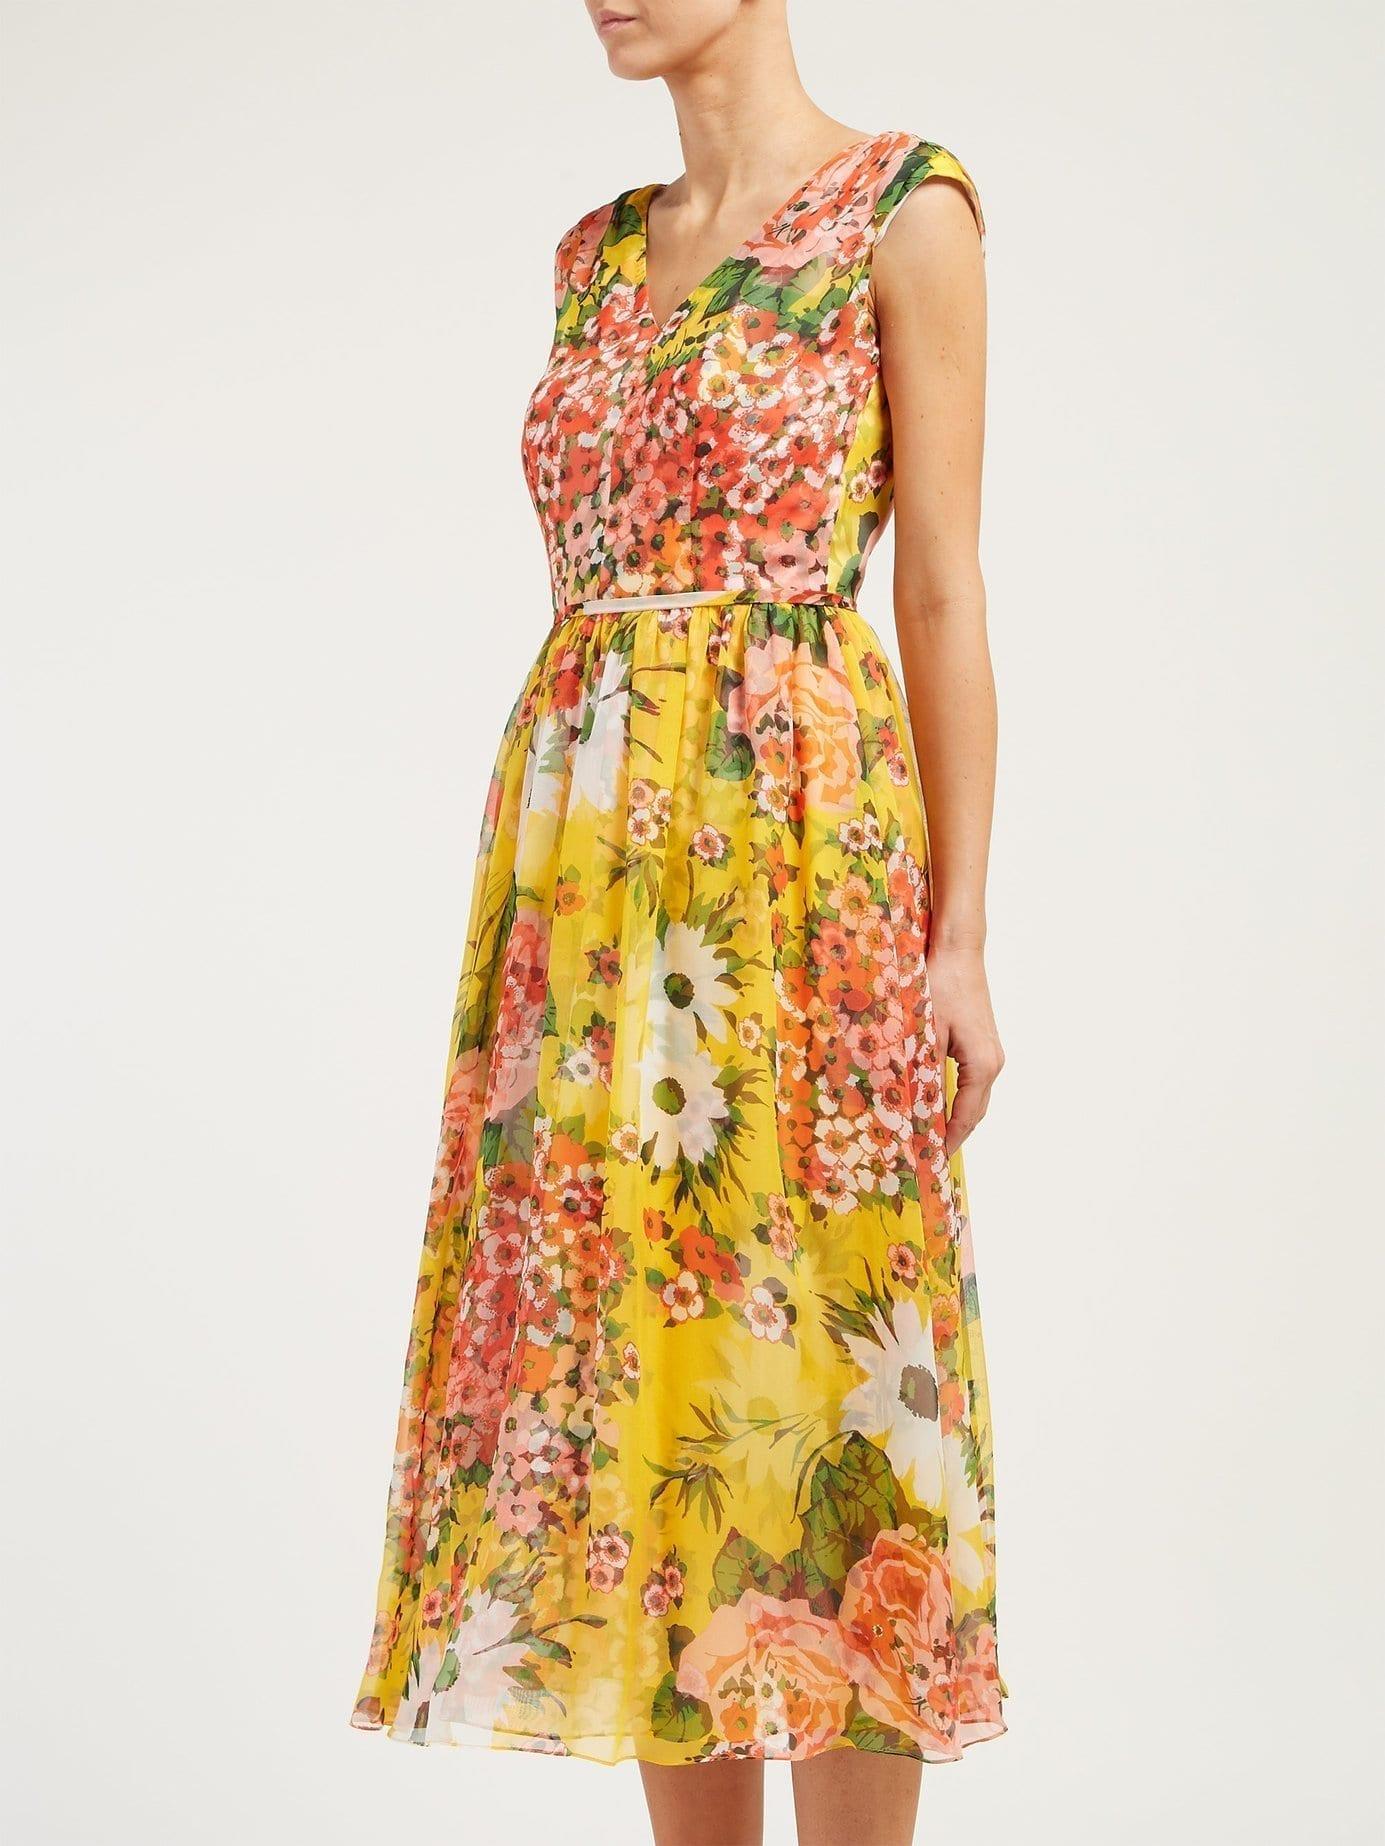 CAROLINA HERRERA Floral-Print Silk-Chiffon Yellow Dress